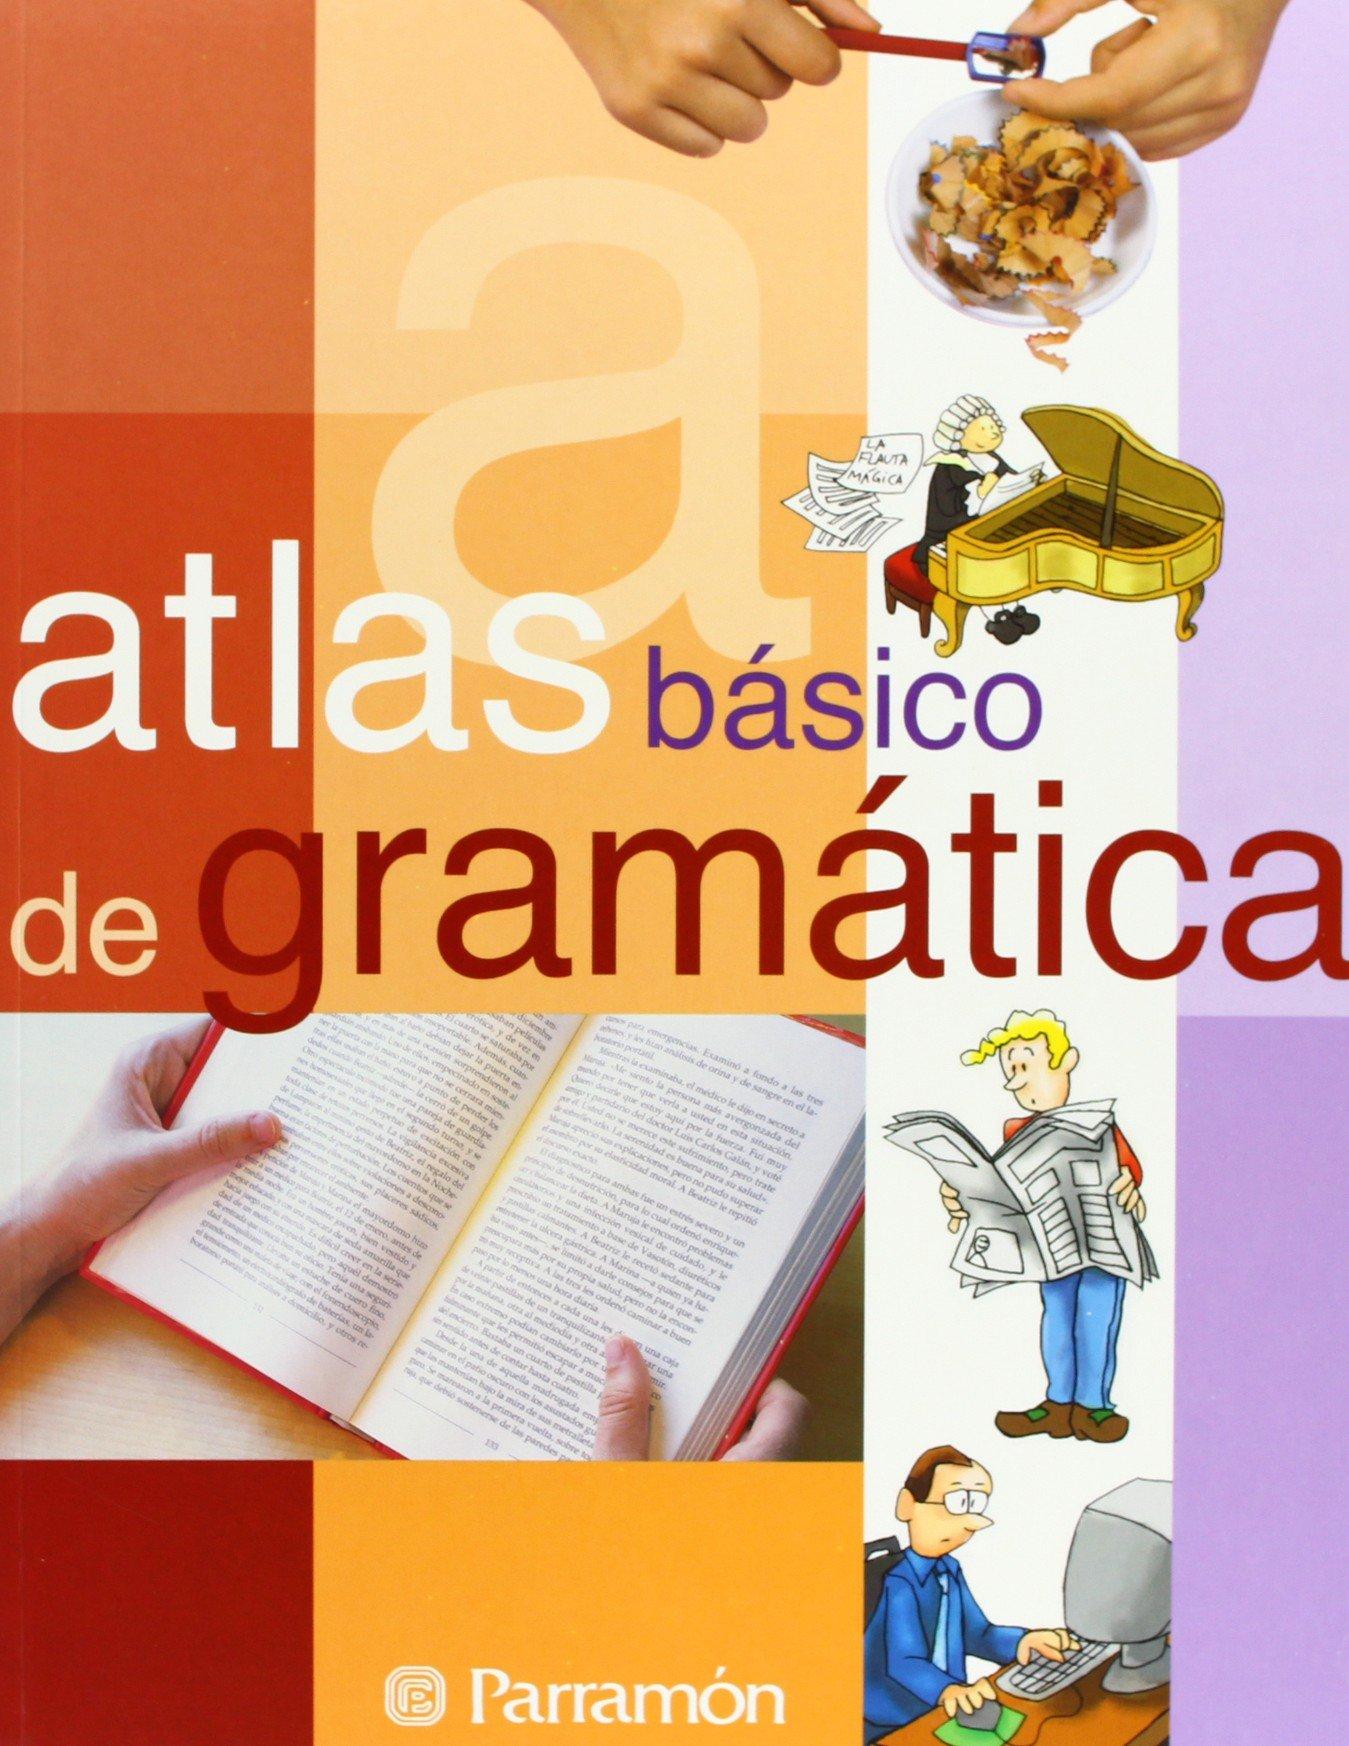 Download Atlas Basico De Gramatica / Basic Atlas of Grammar (Spanish Edition) PDF